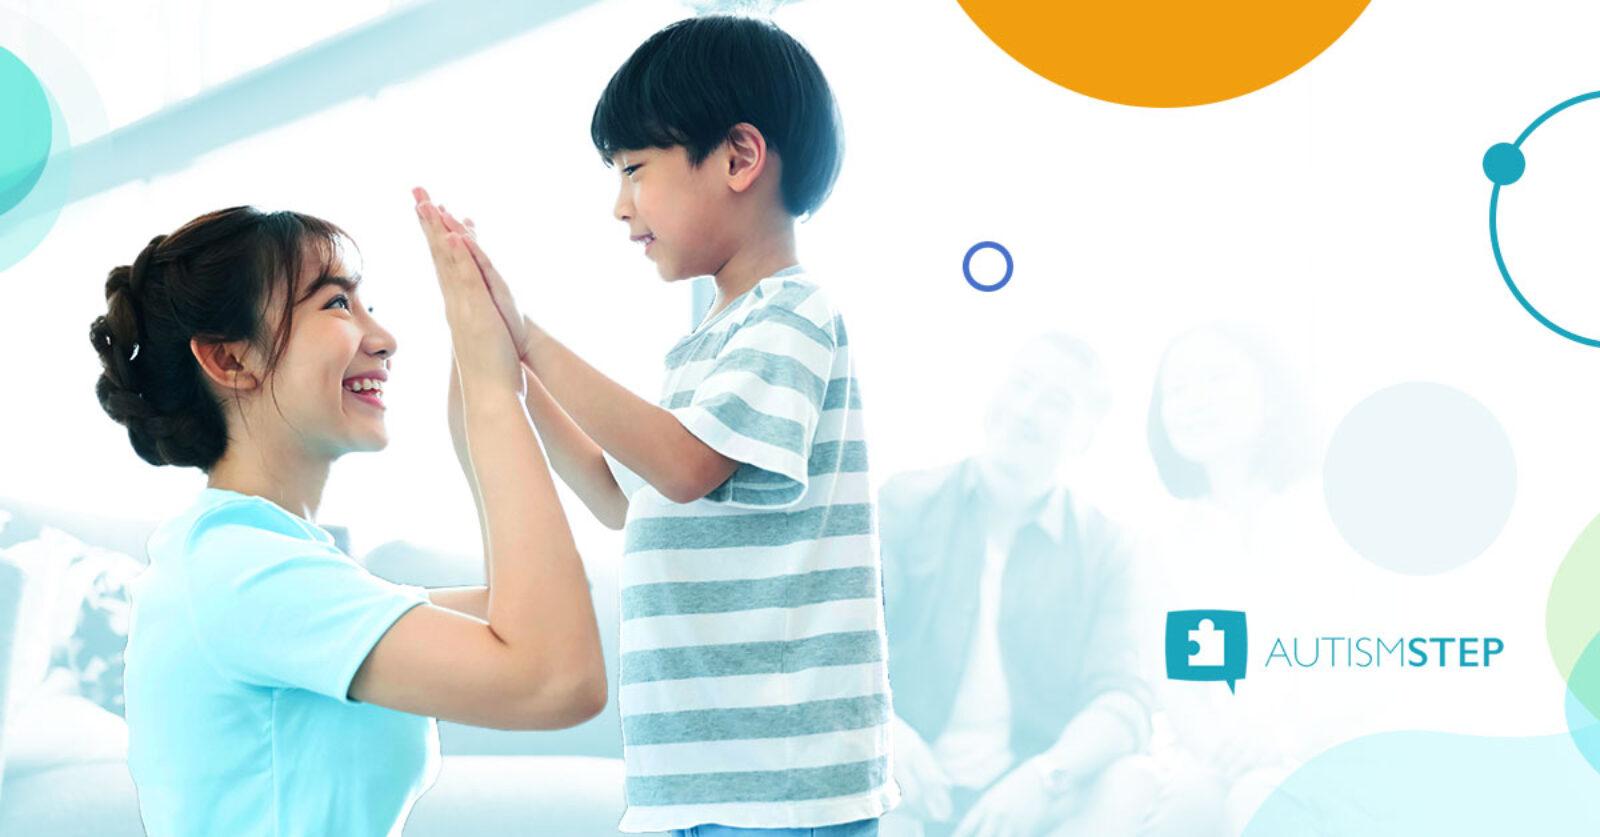 Austismstep-Autism-Treatment-Singapore